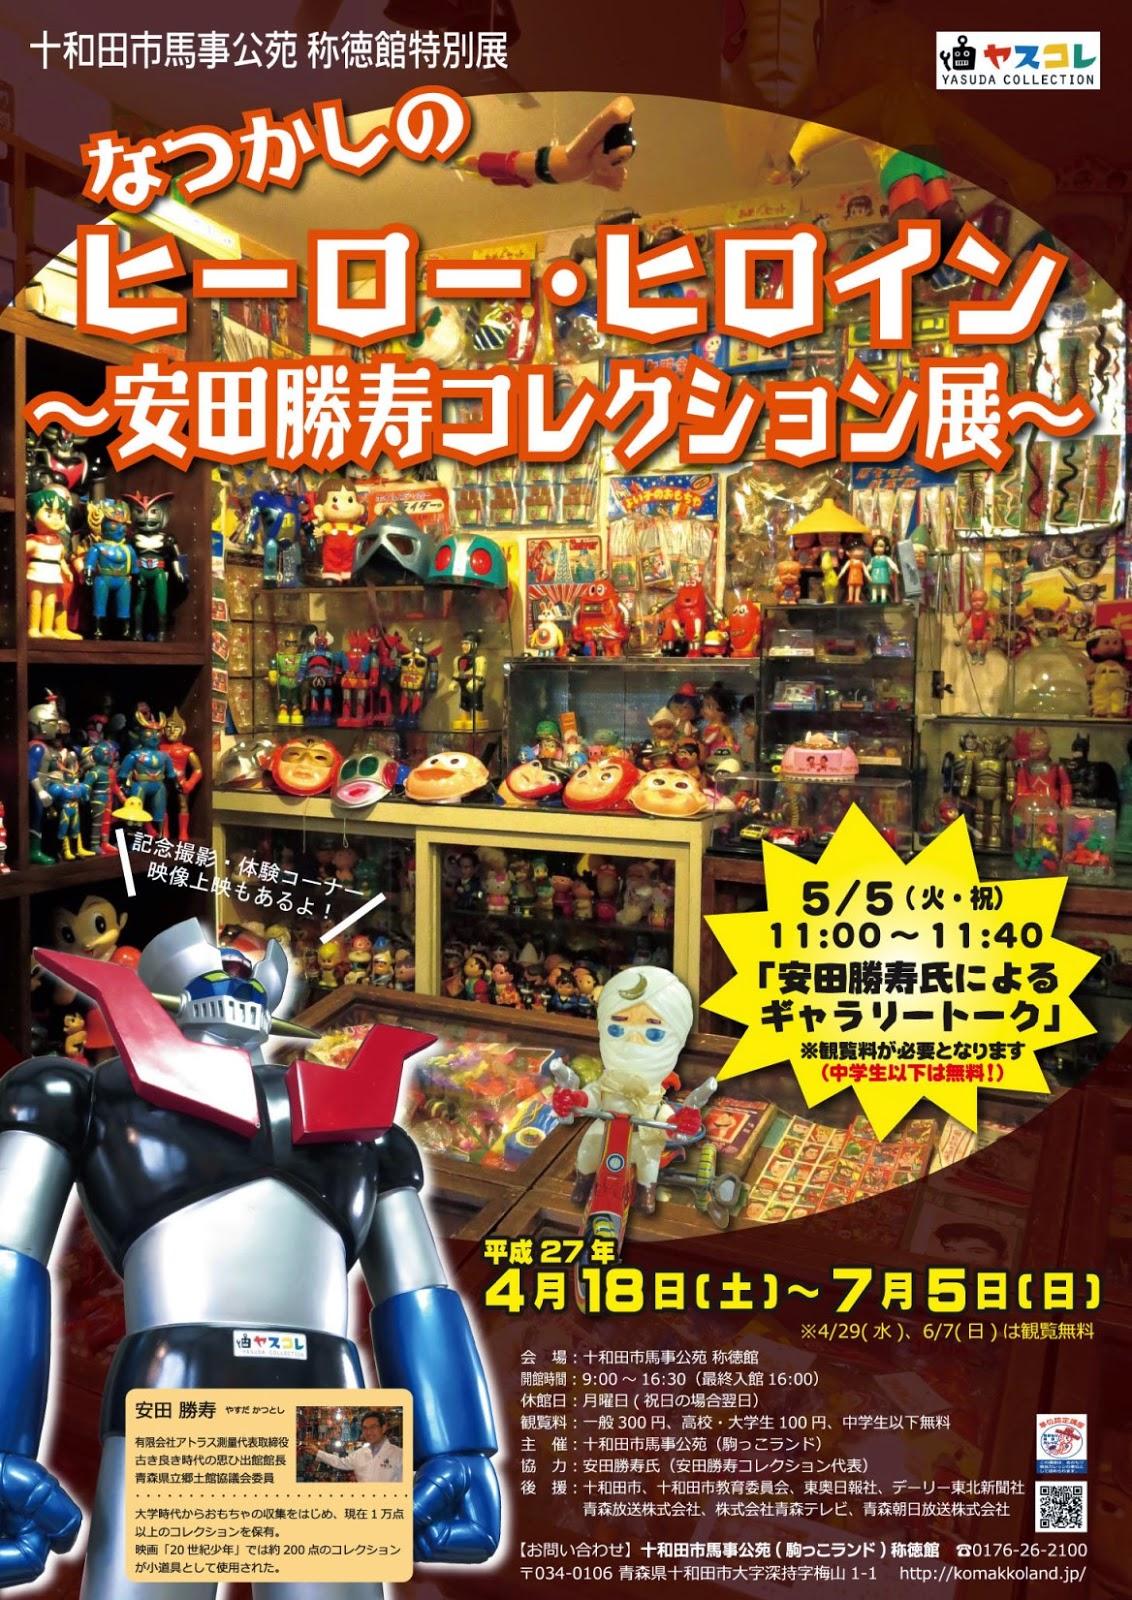 Shotokukan Nostalgic Heroes & Heroines Special Exhibit Towada Komakkoland 十和田市駒っこランド 称徳館 特別展示 なつかしいヒーロー・ヒロイン 安田勝寿コレクション展